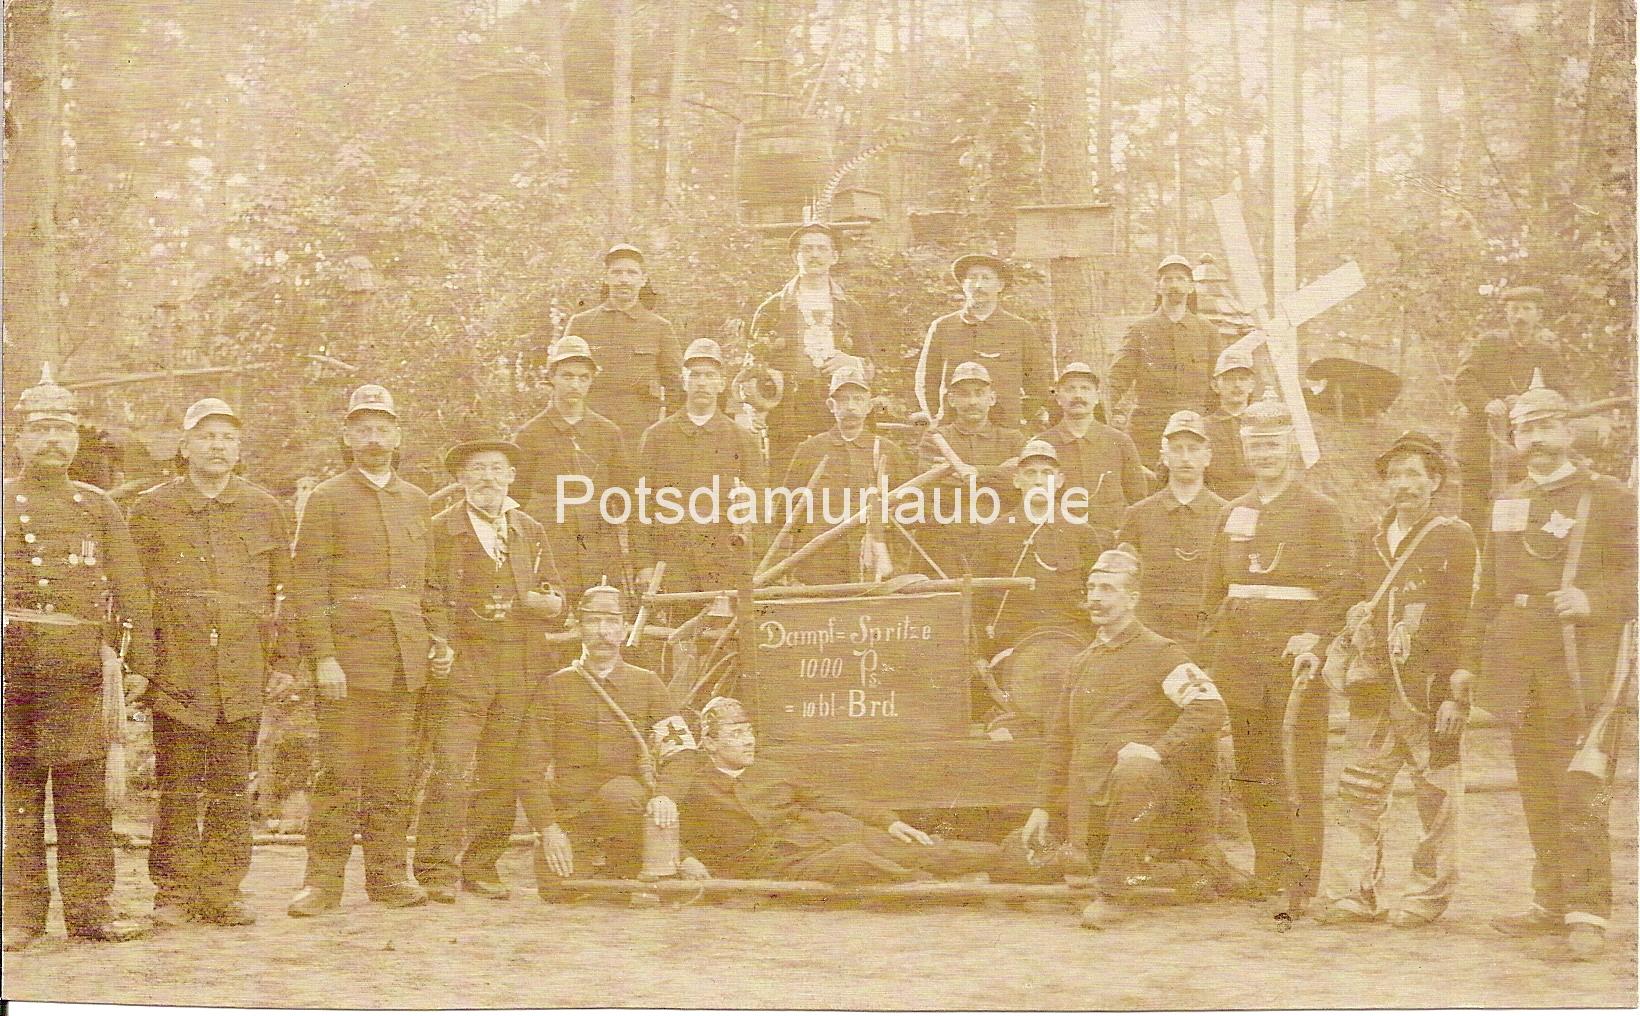 1910 10 18 v